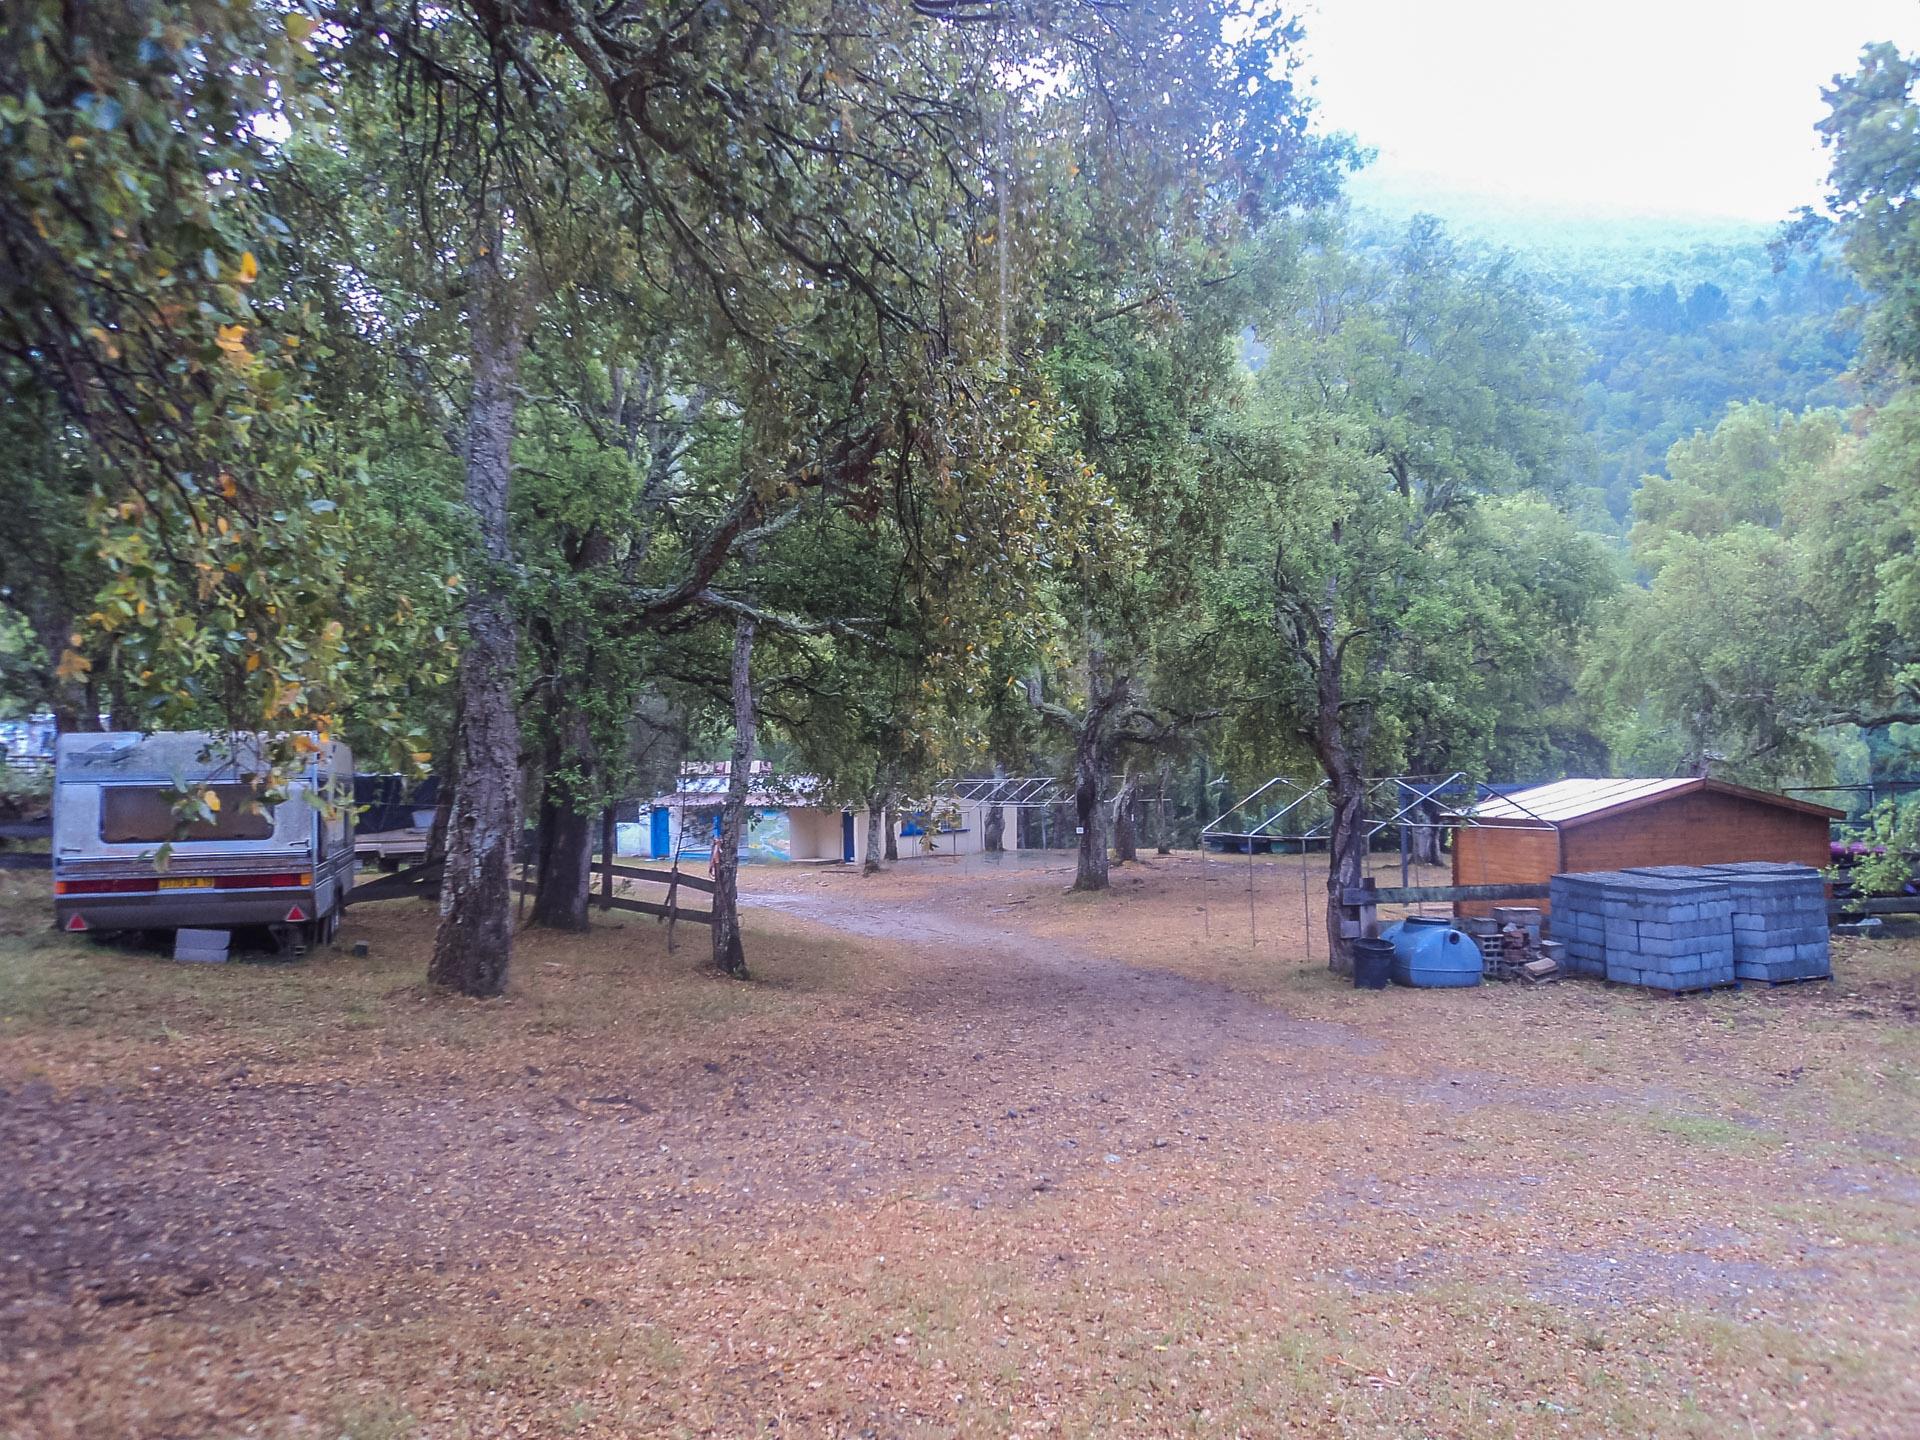 Camping U Sortipiani